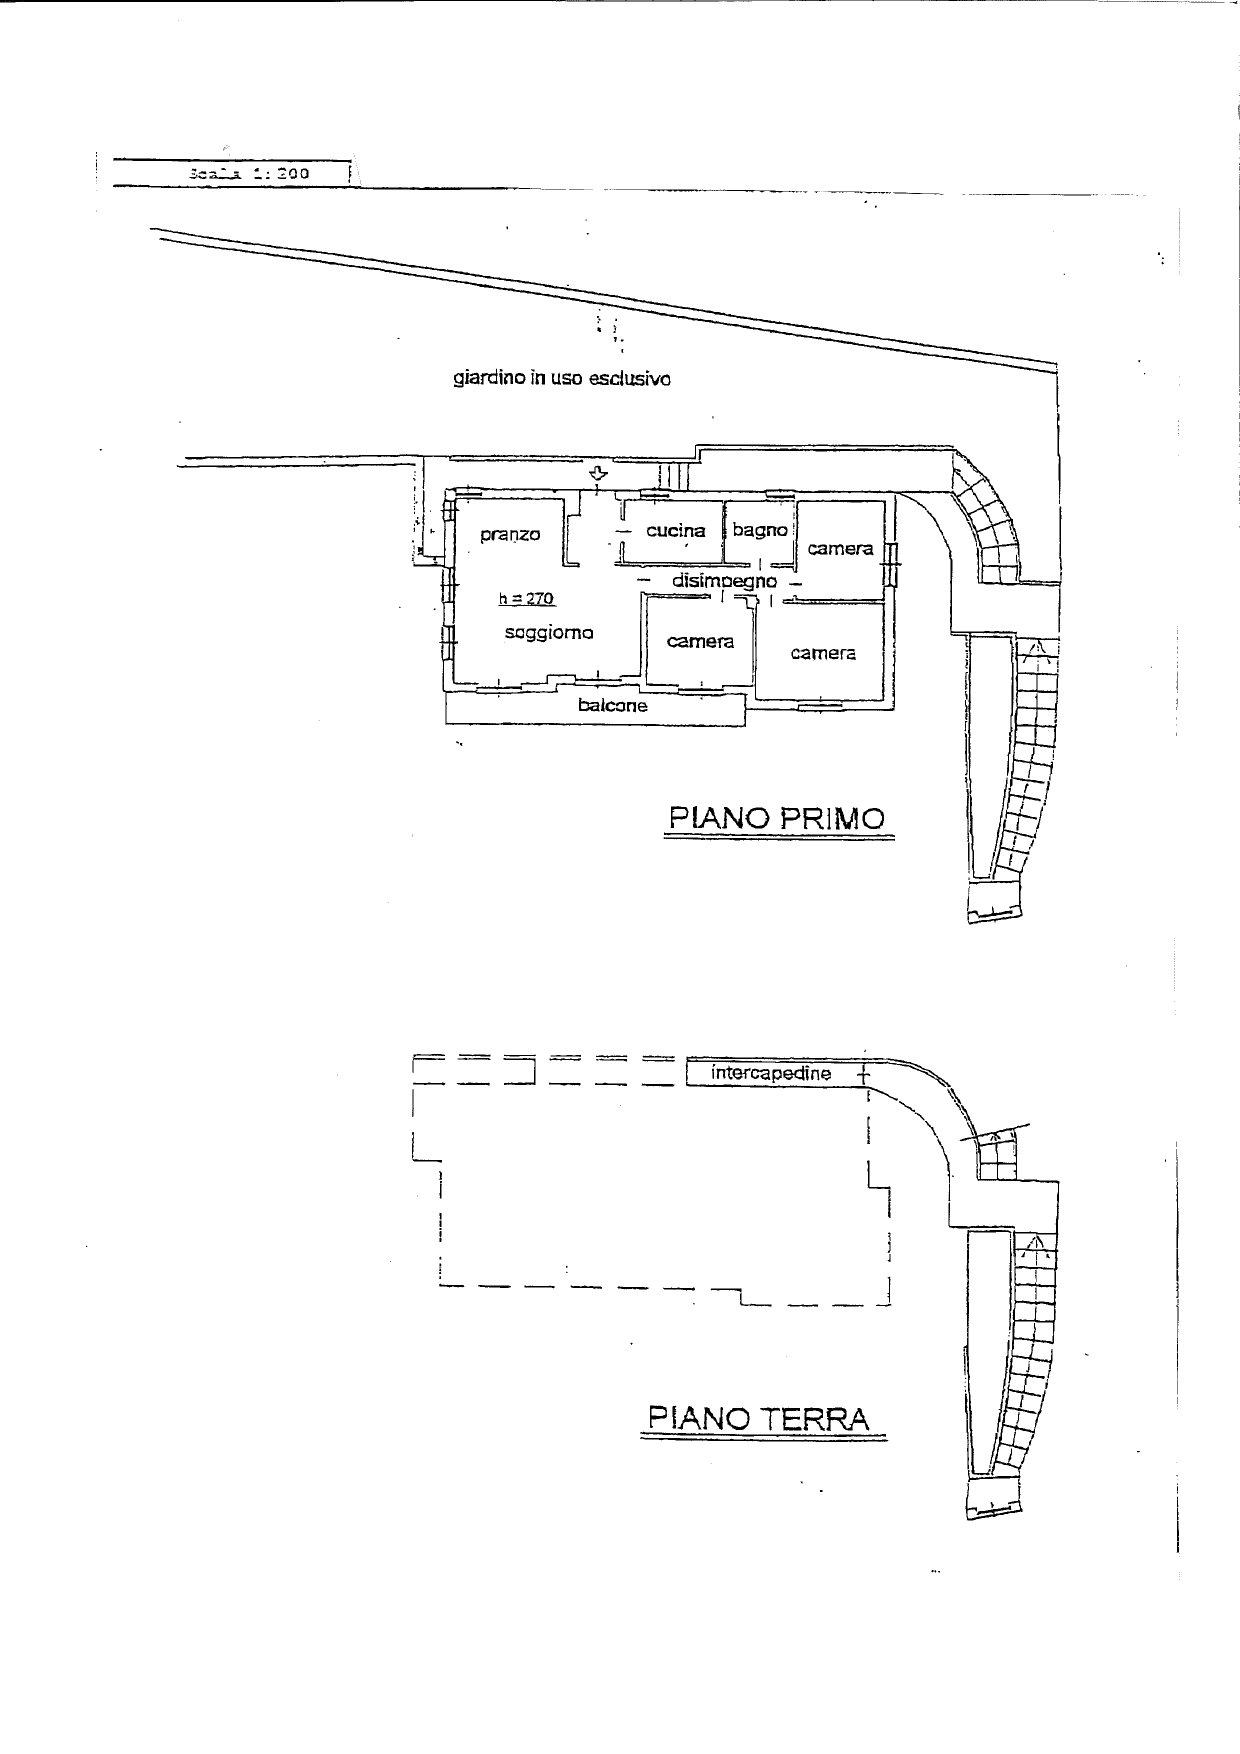 Francesco_Papurello_..  Traeger Grill Wiring Diagram on